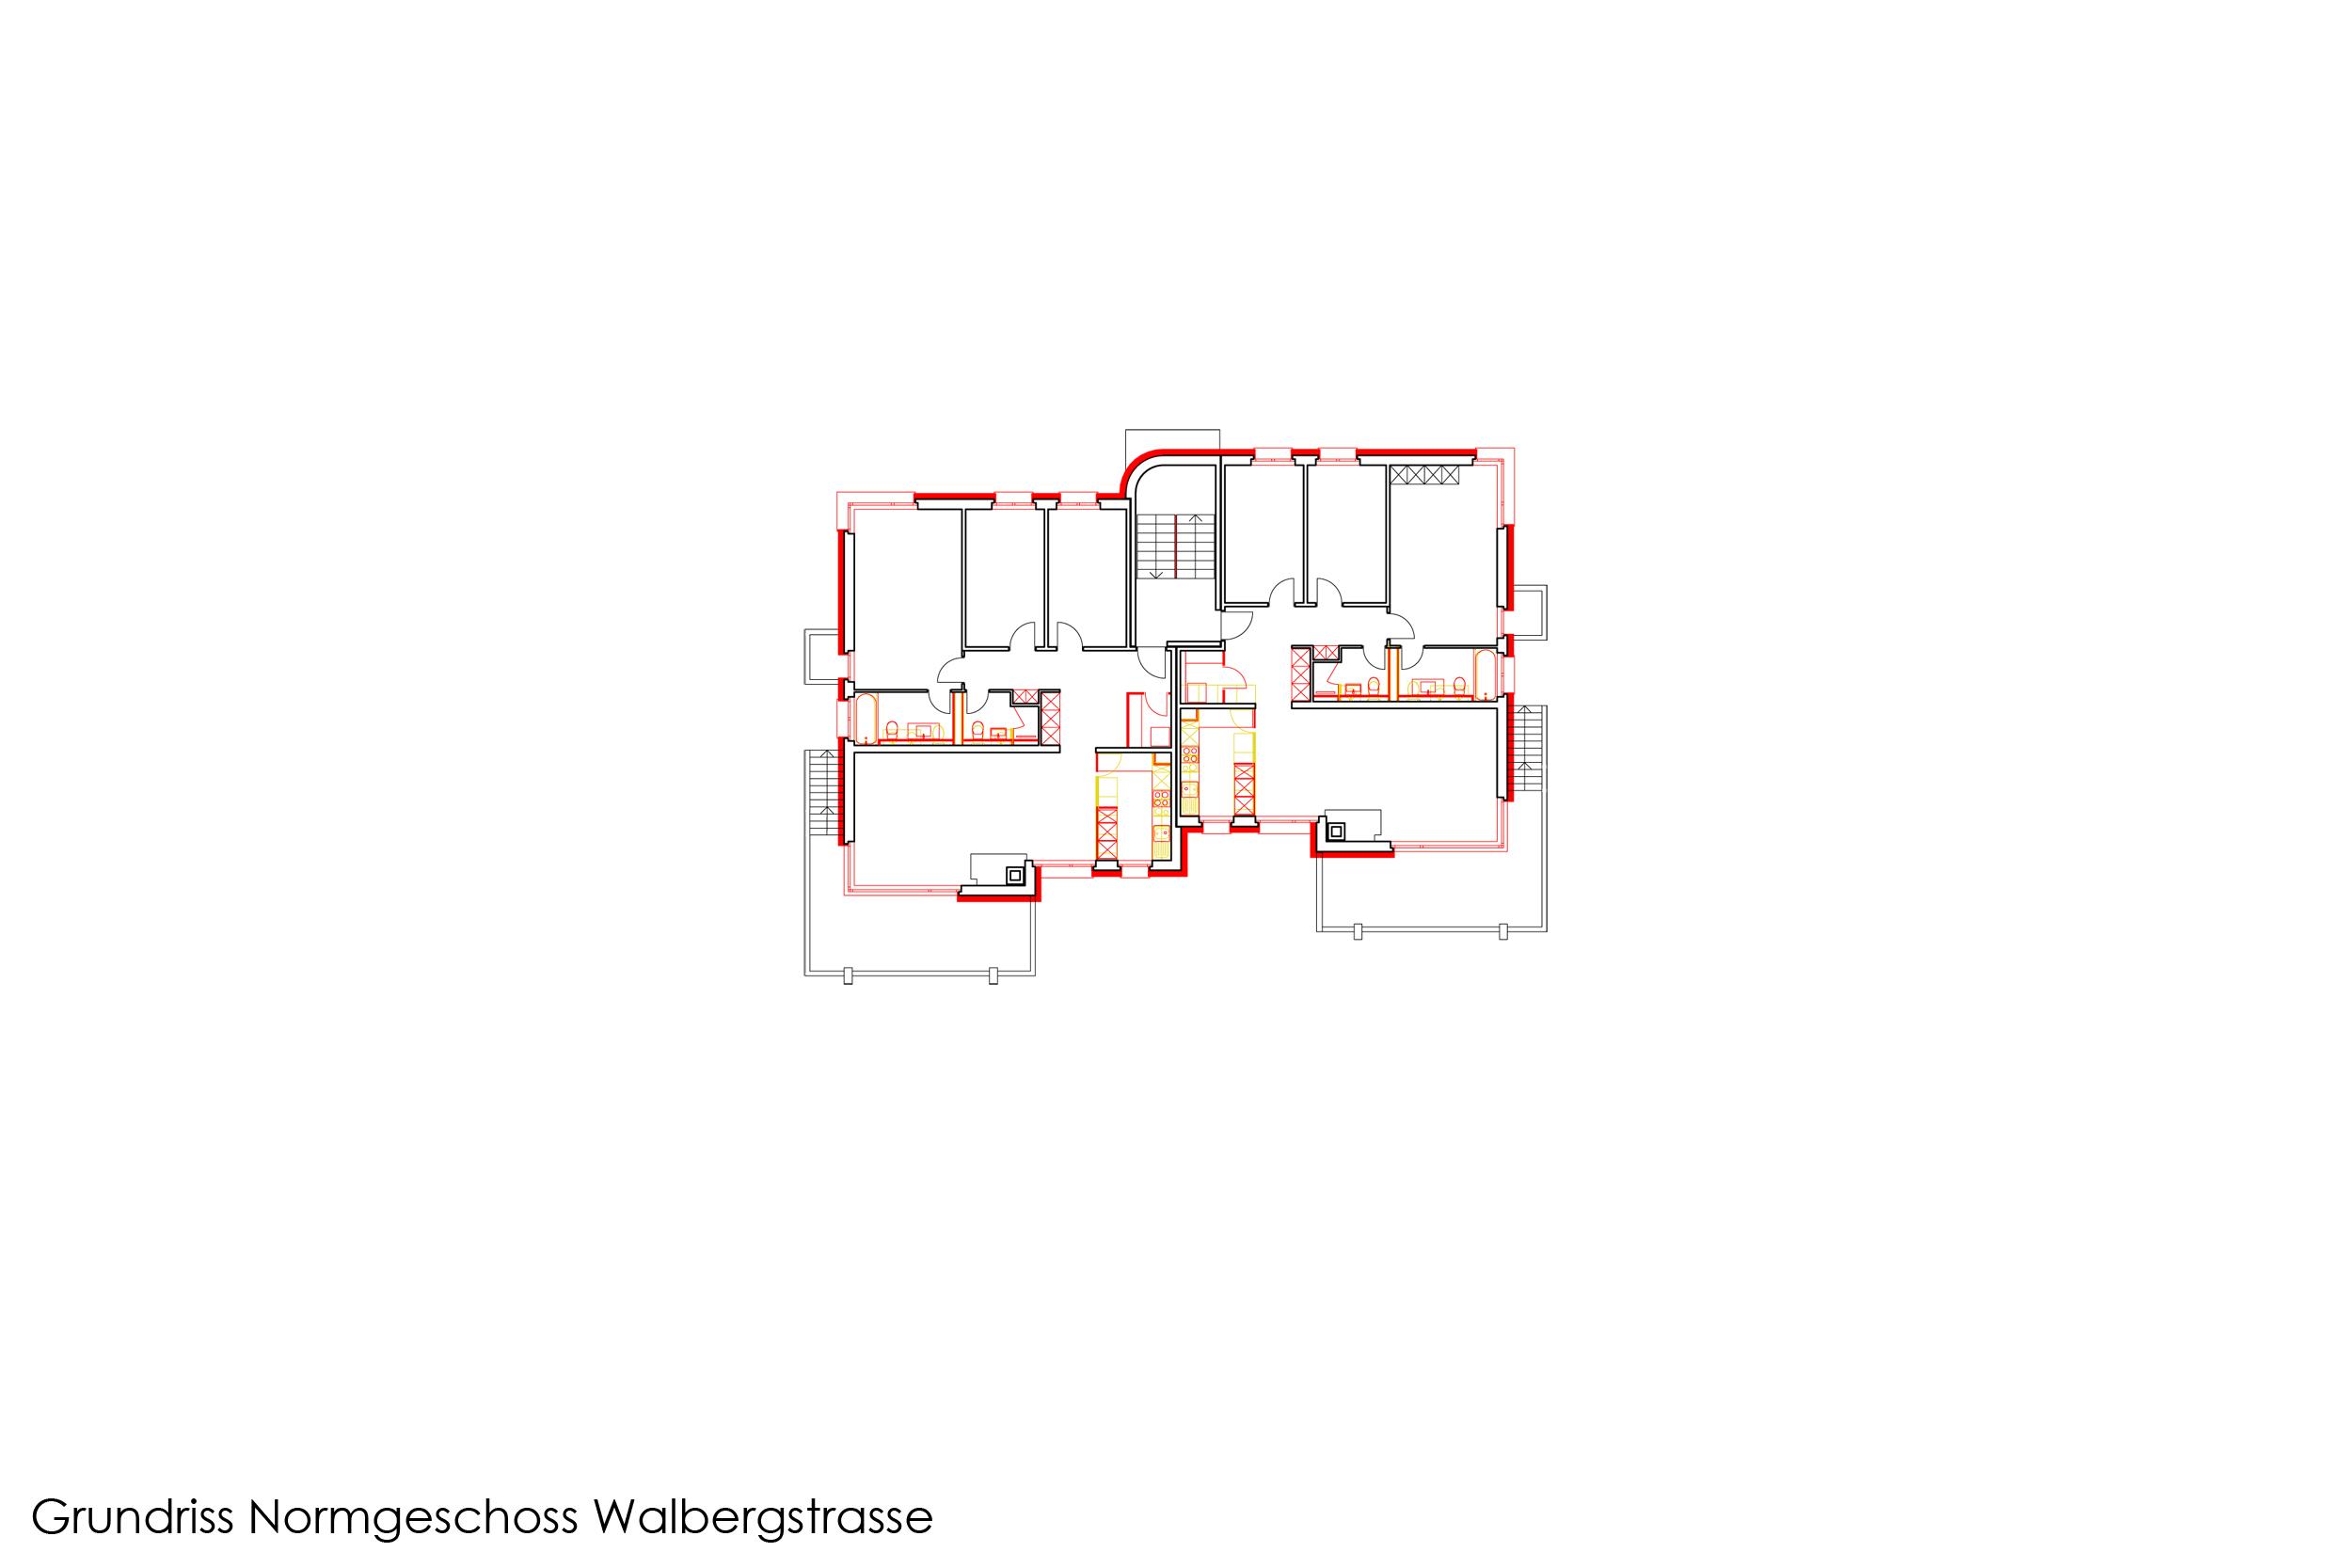 15-23 Walbergstrasse gr normgeschoss.jpg